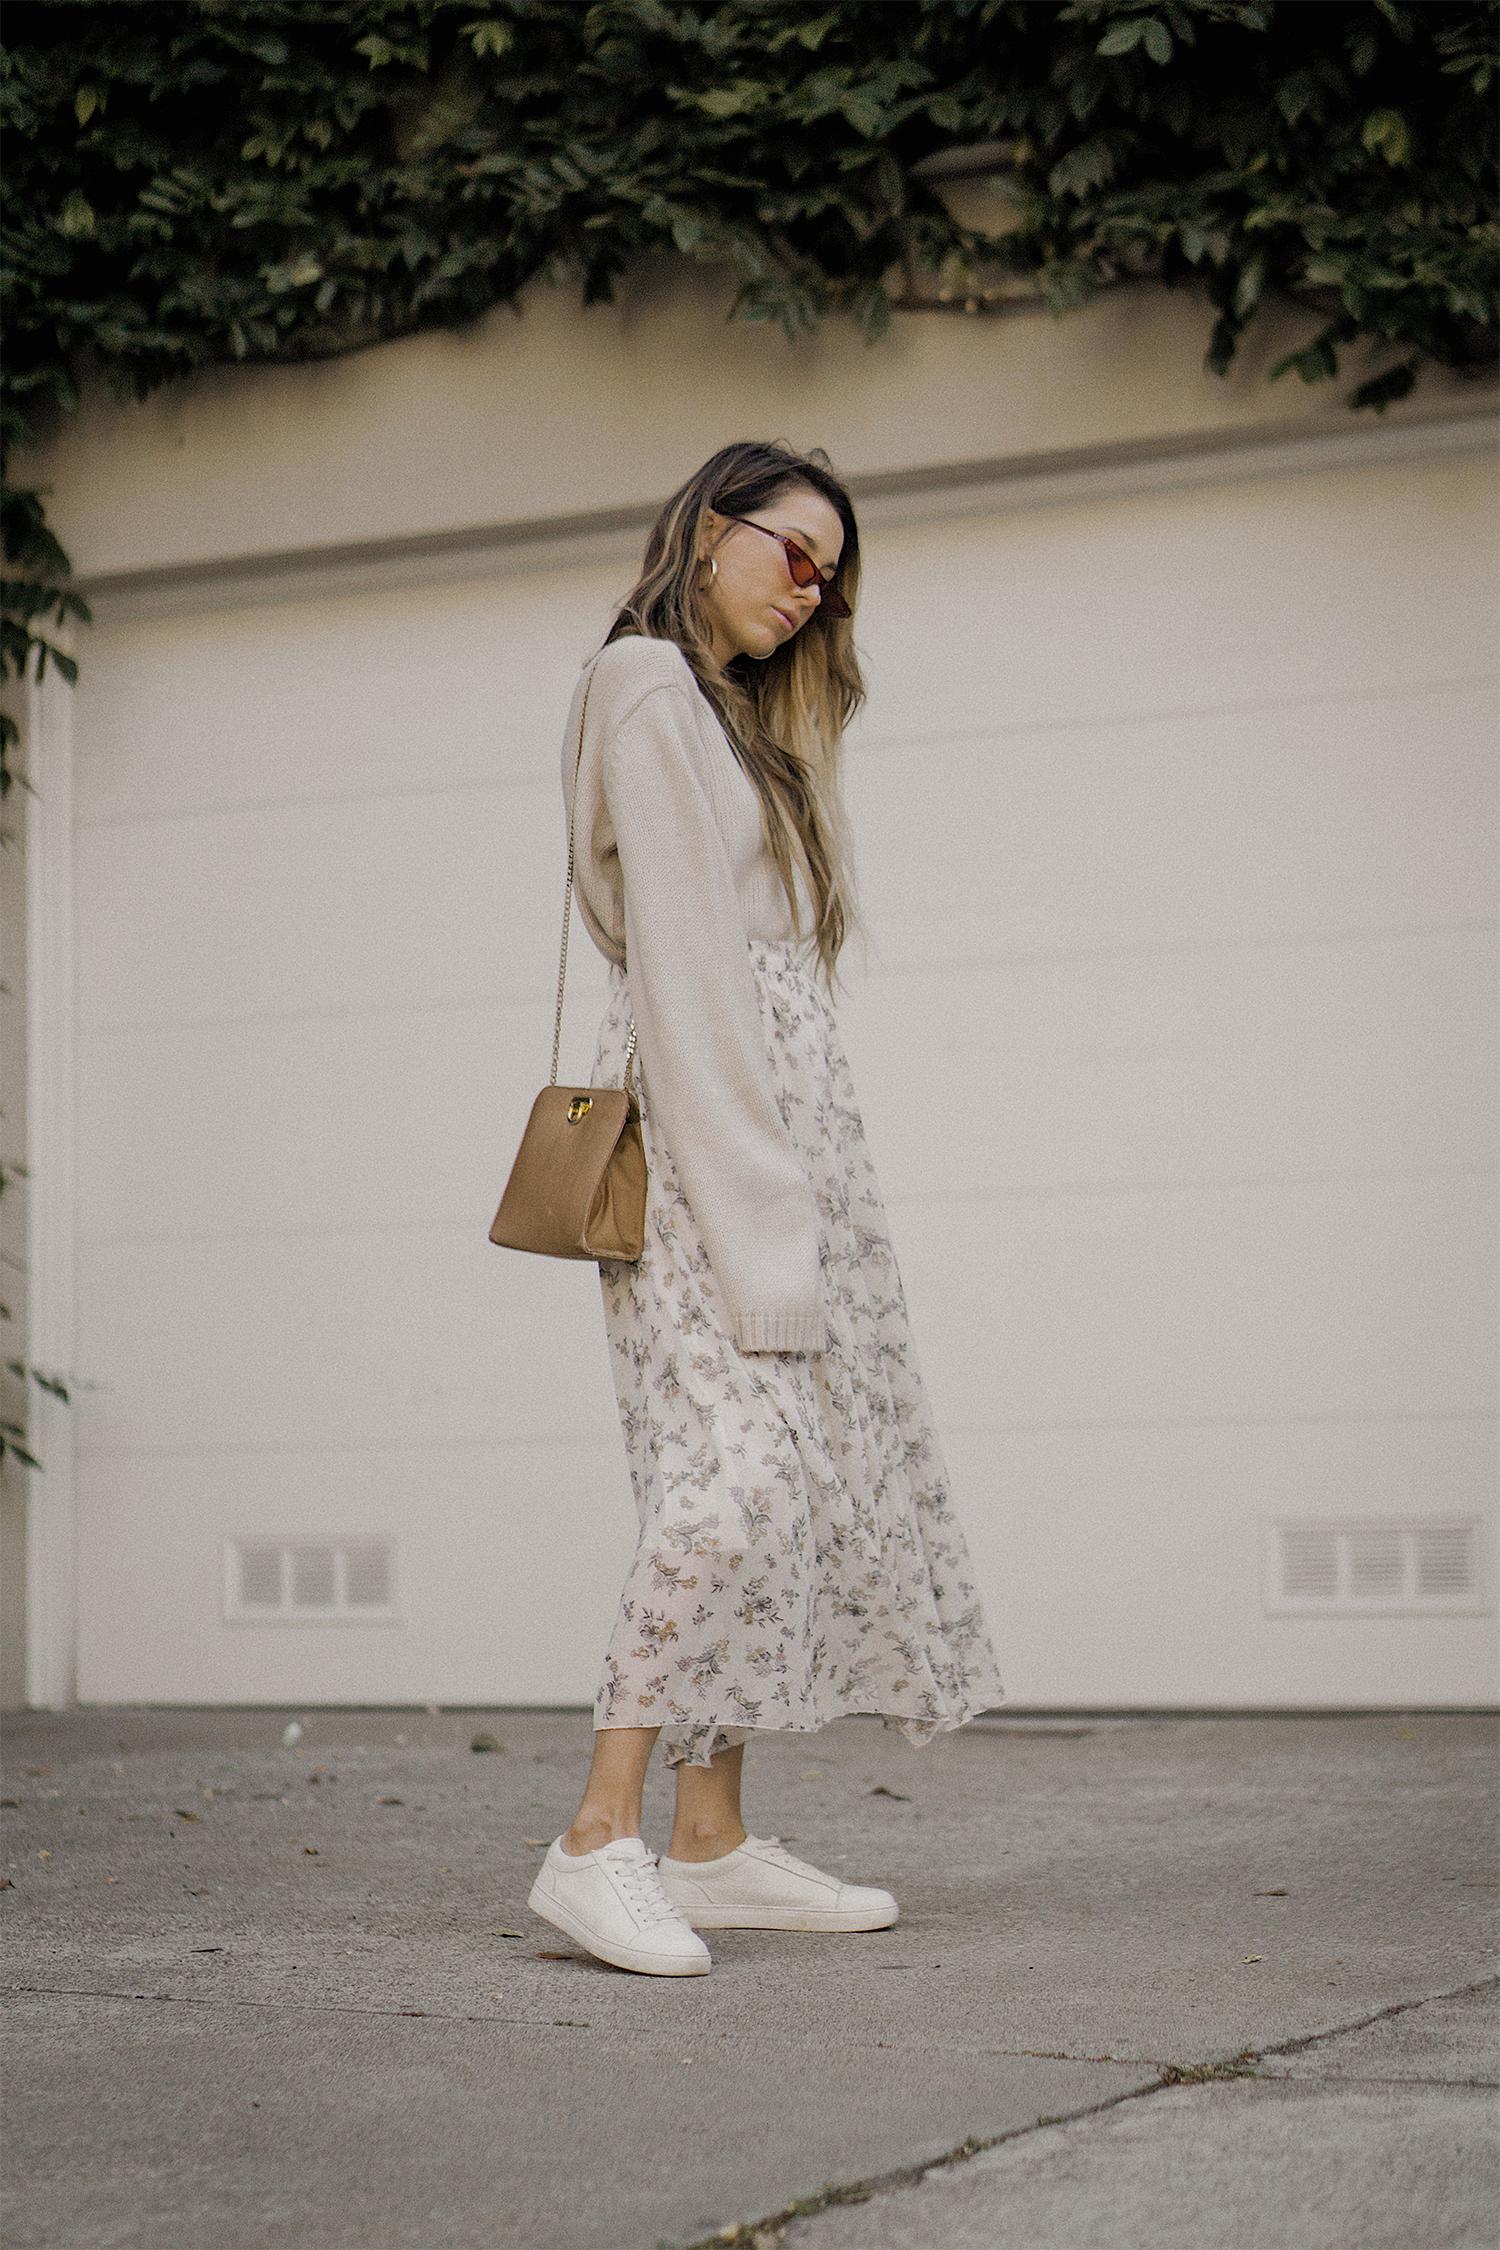 neutral_outfit_street_style_look_beige_tobi_sweater_long_skirt_romantic_beret_sneakers_vintage_lena_juice_the_white_ocean_03